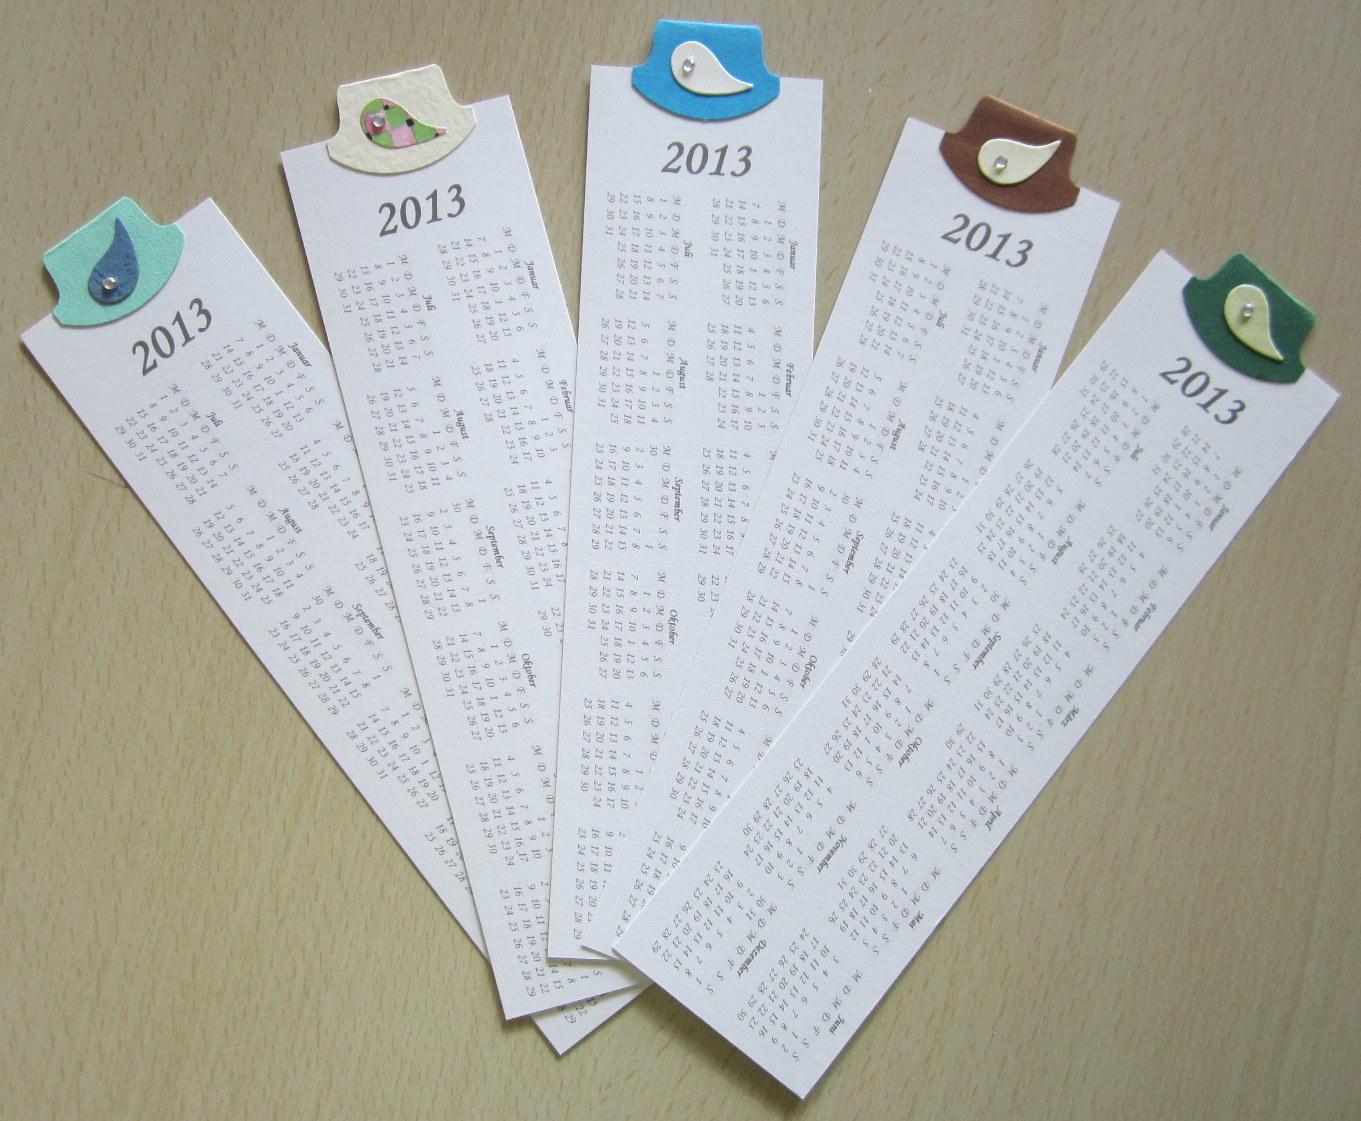 Diamantin´s Hobbywelt: Kalender-Lesezeichen